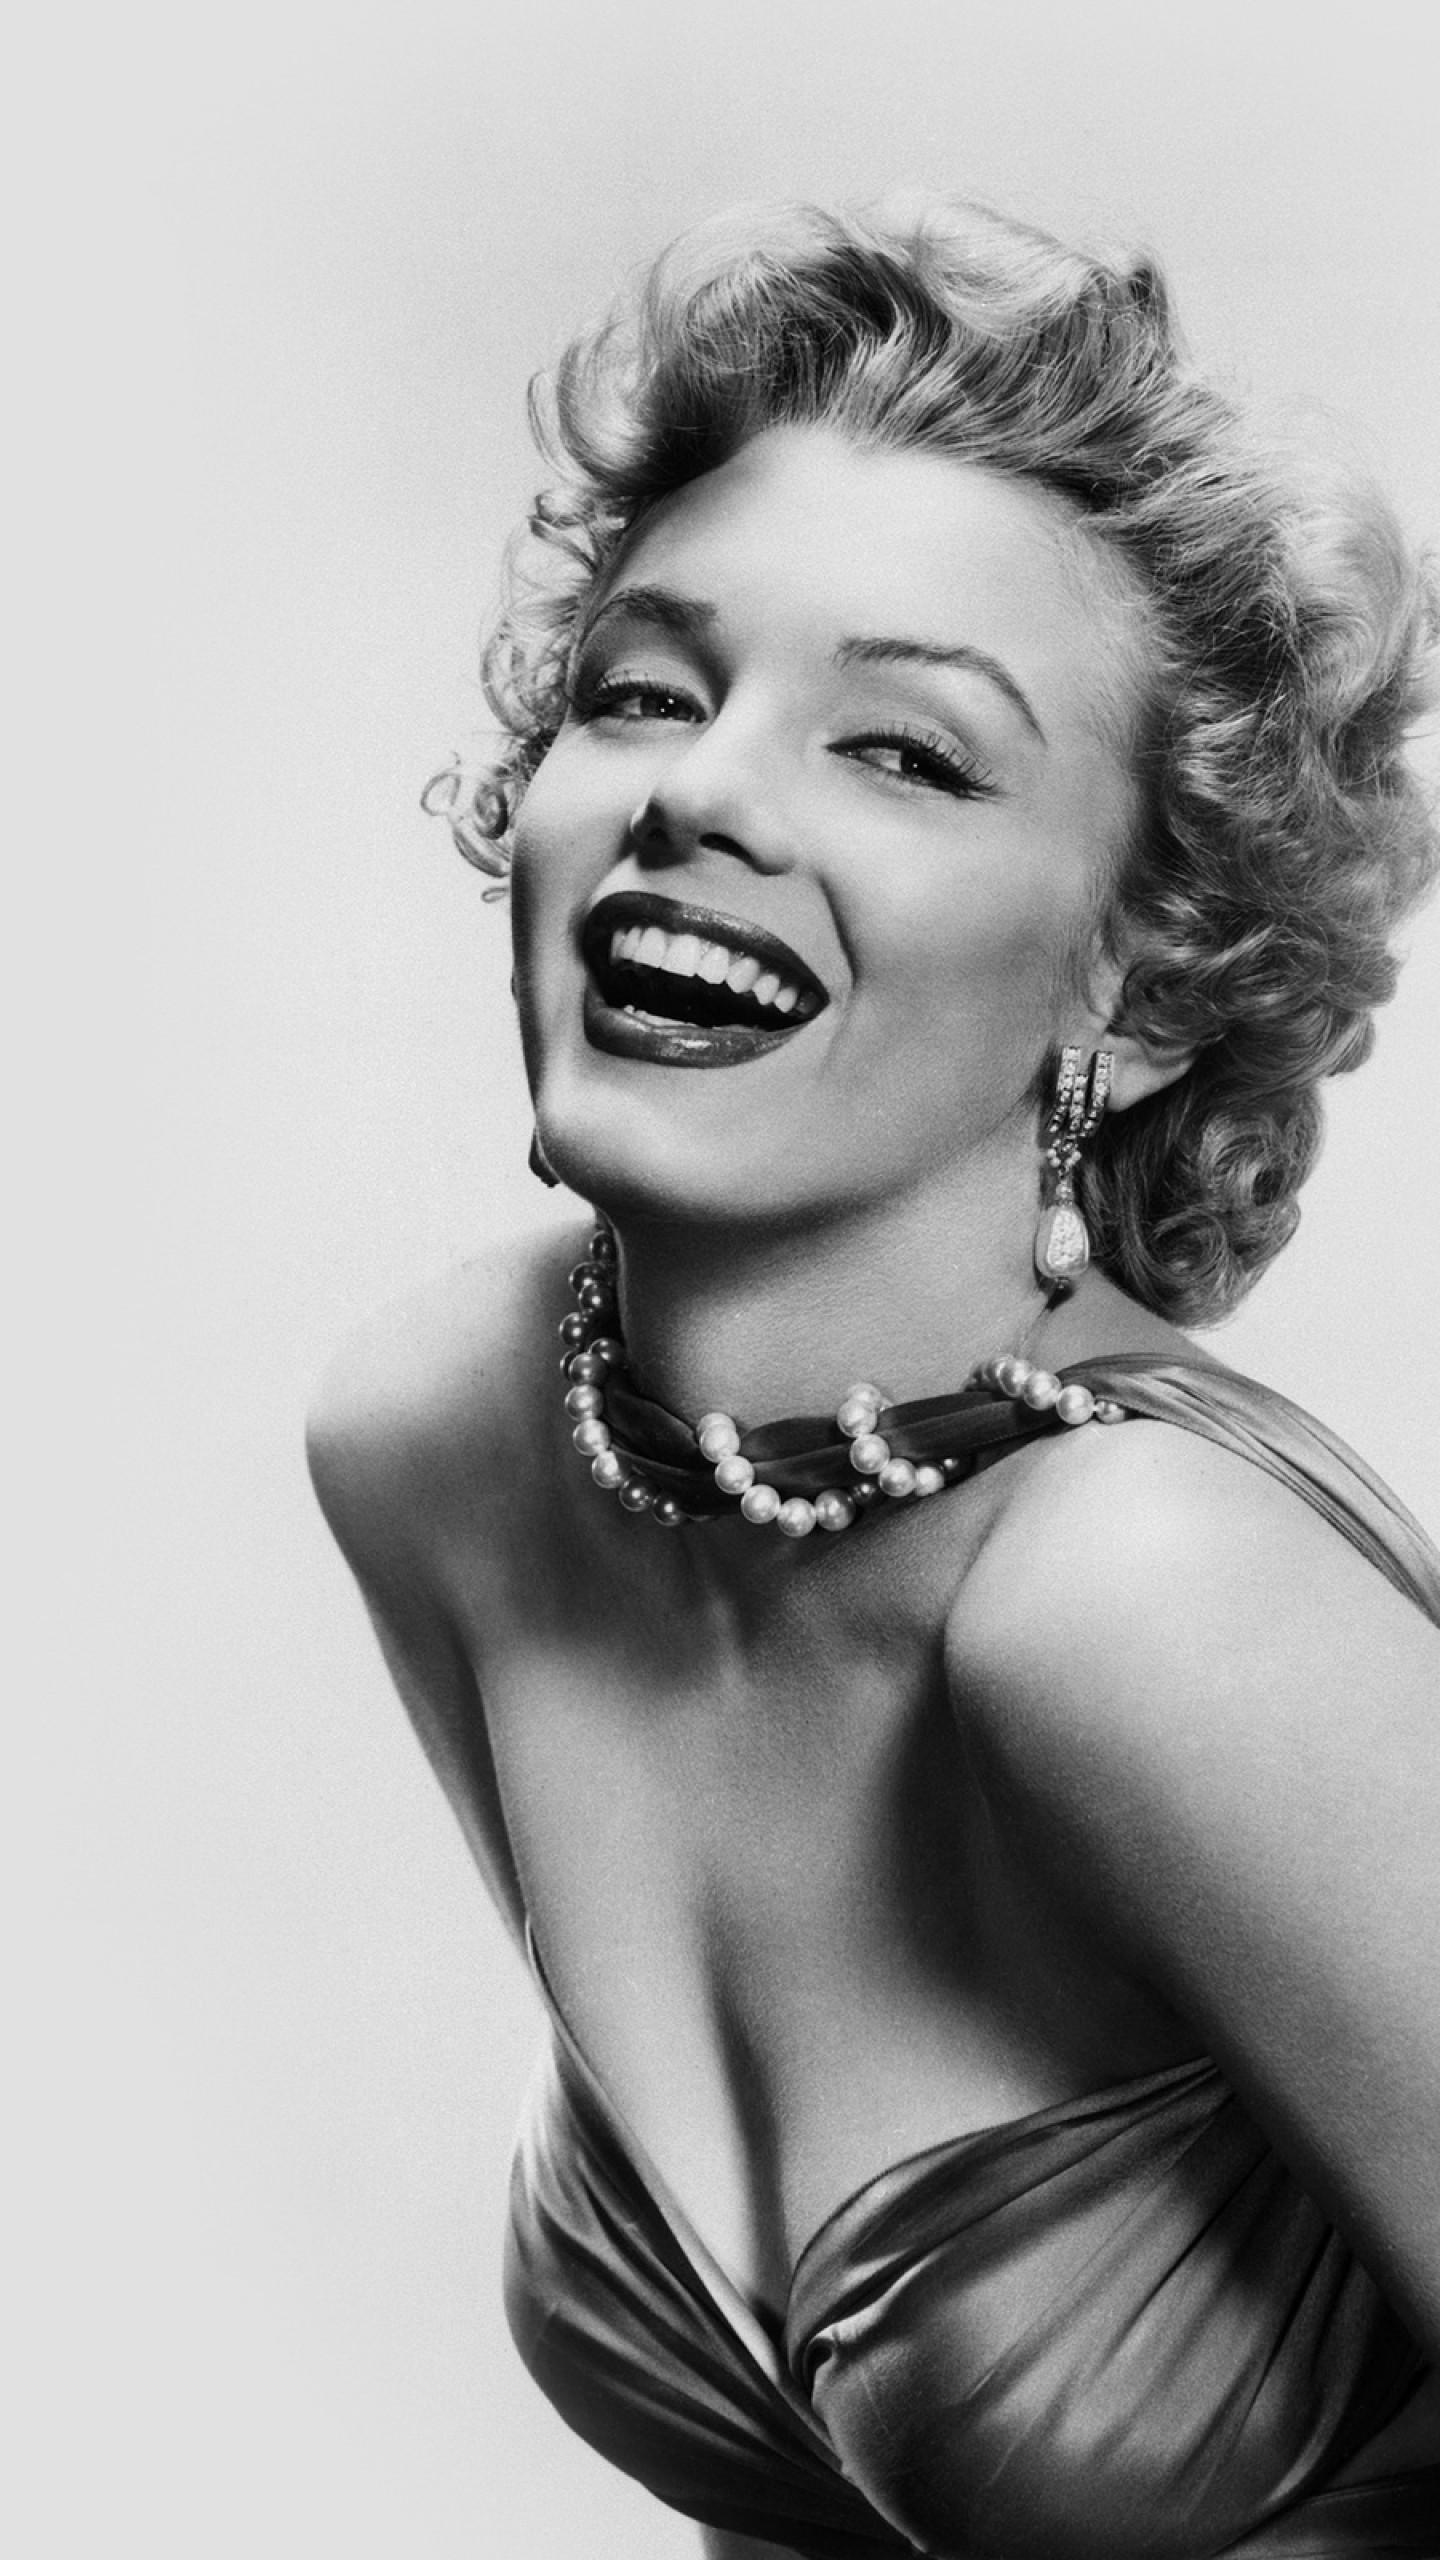 Preview wallpaper marilyn monroe, celebrity, blonde, smile, charm, black  white 1440×2560